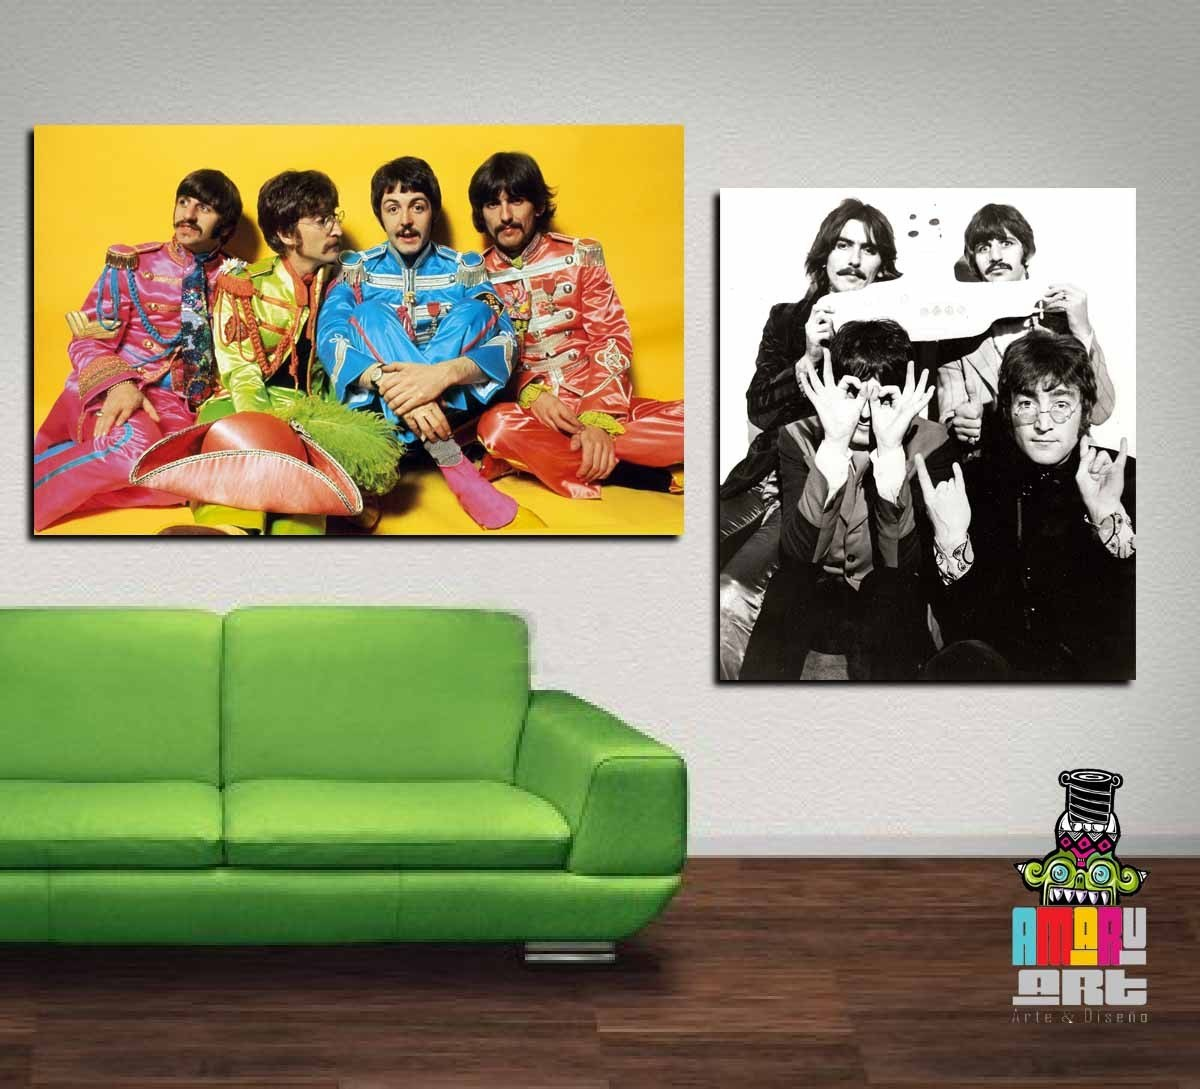 Cuadros posters de the beatles s 30 00 en mercado libre - Posters para pared ...